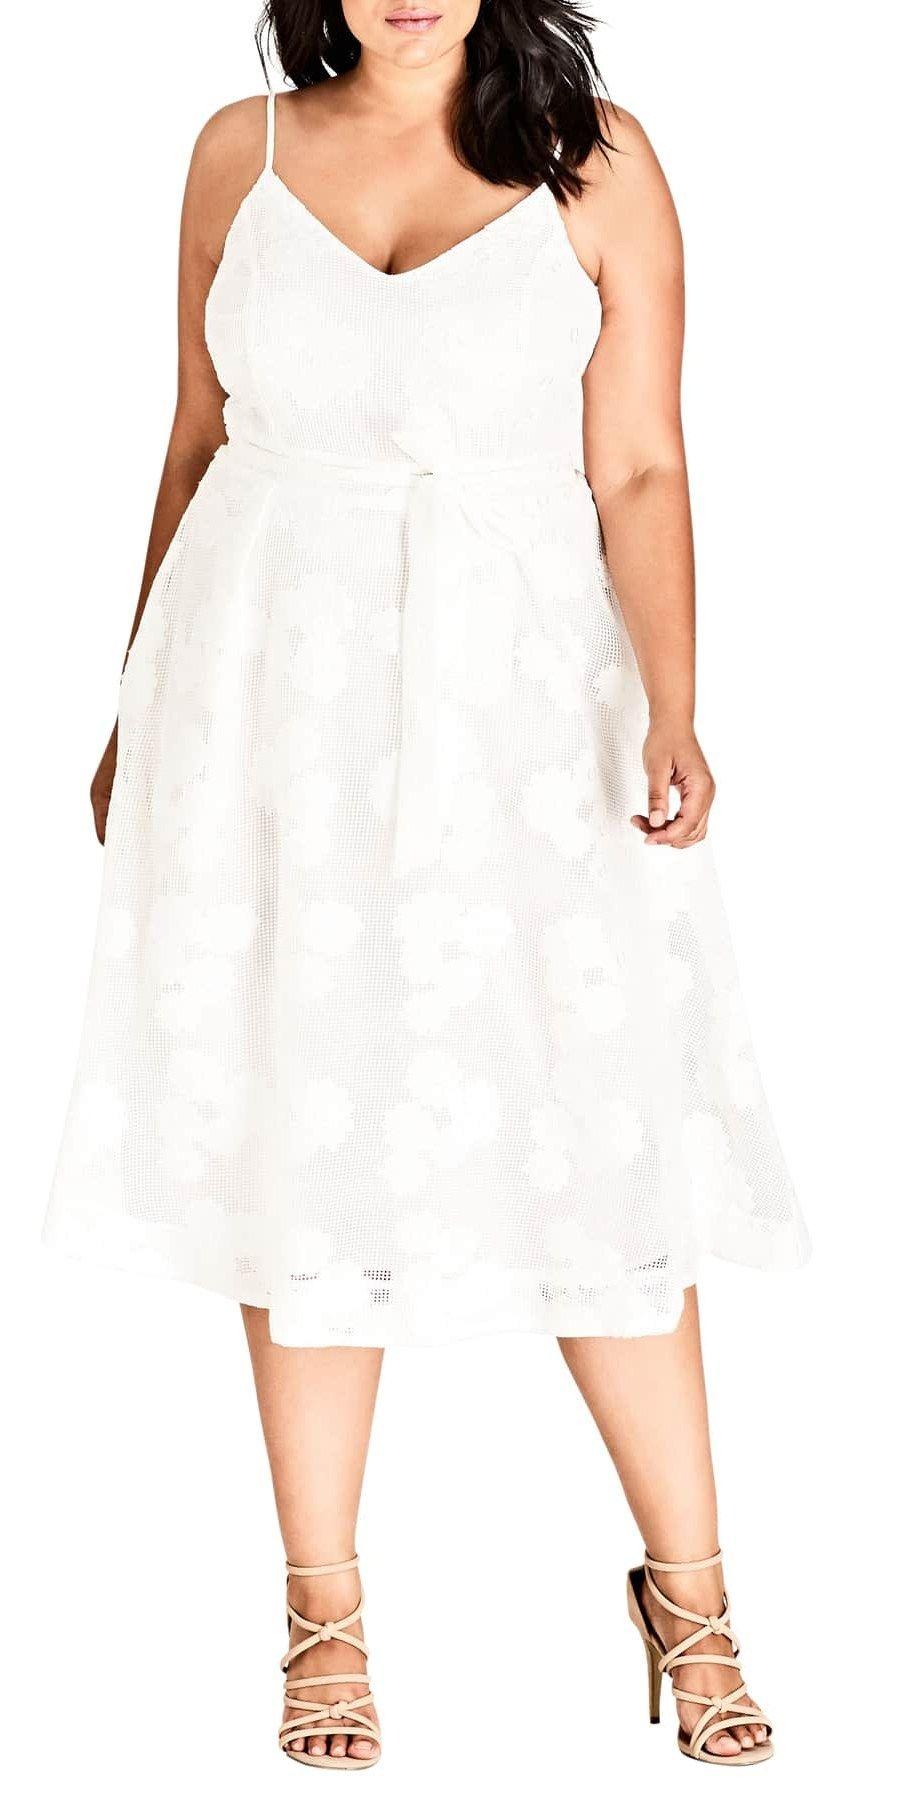 674ef4439f 20 Plus Size Rehearsal Dinner Dresses - Plus Size White Dress for  Bachelorette Party - Alexa Webb - alexawebb.com  plussize  alexawebb